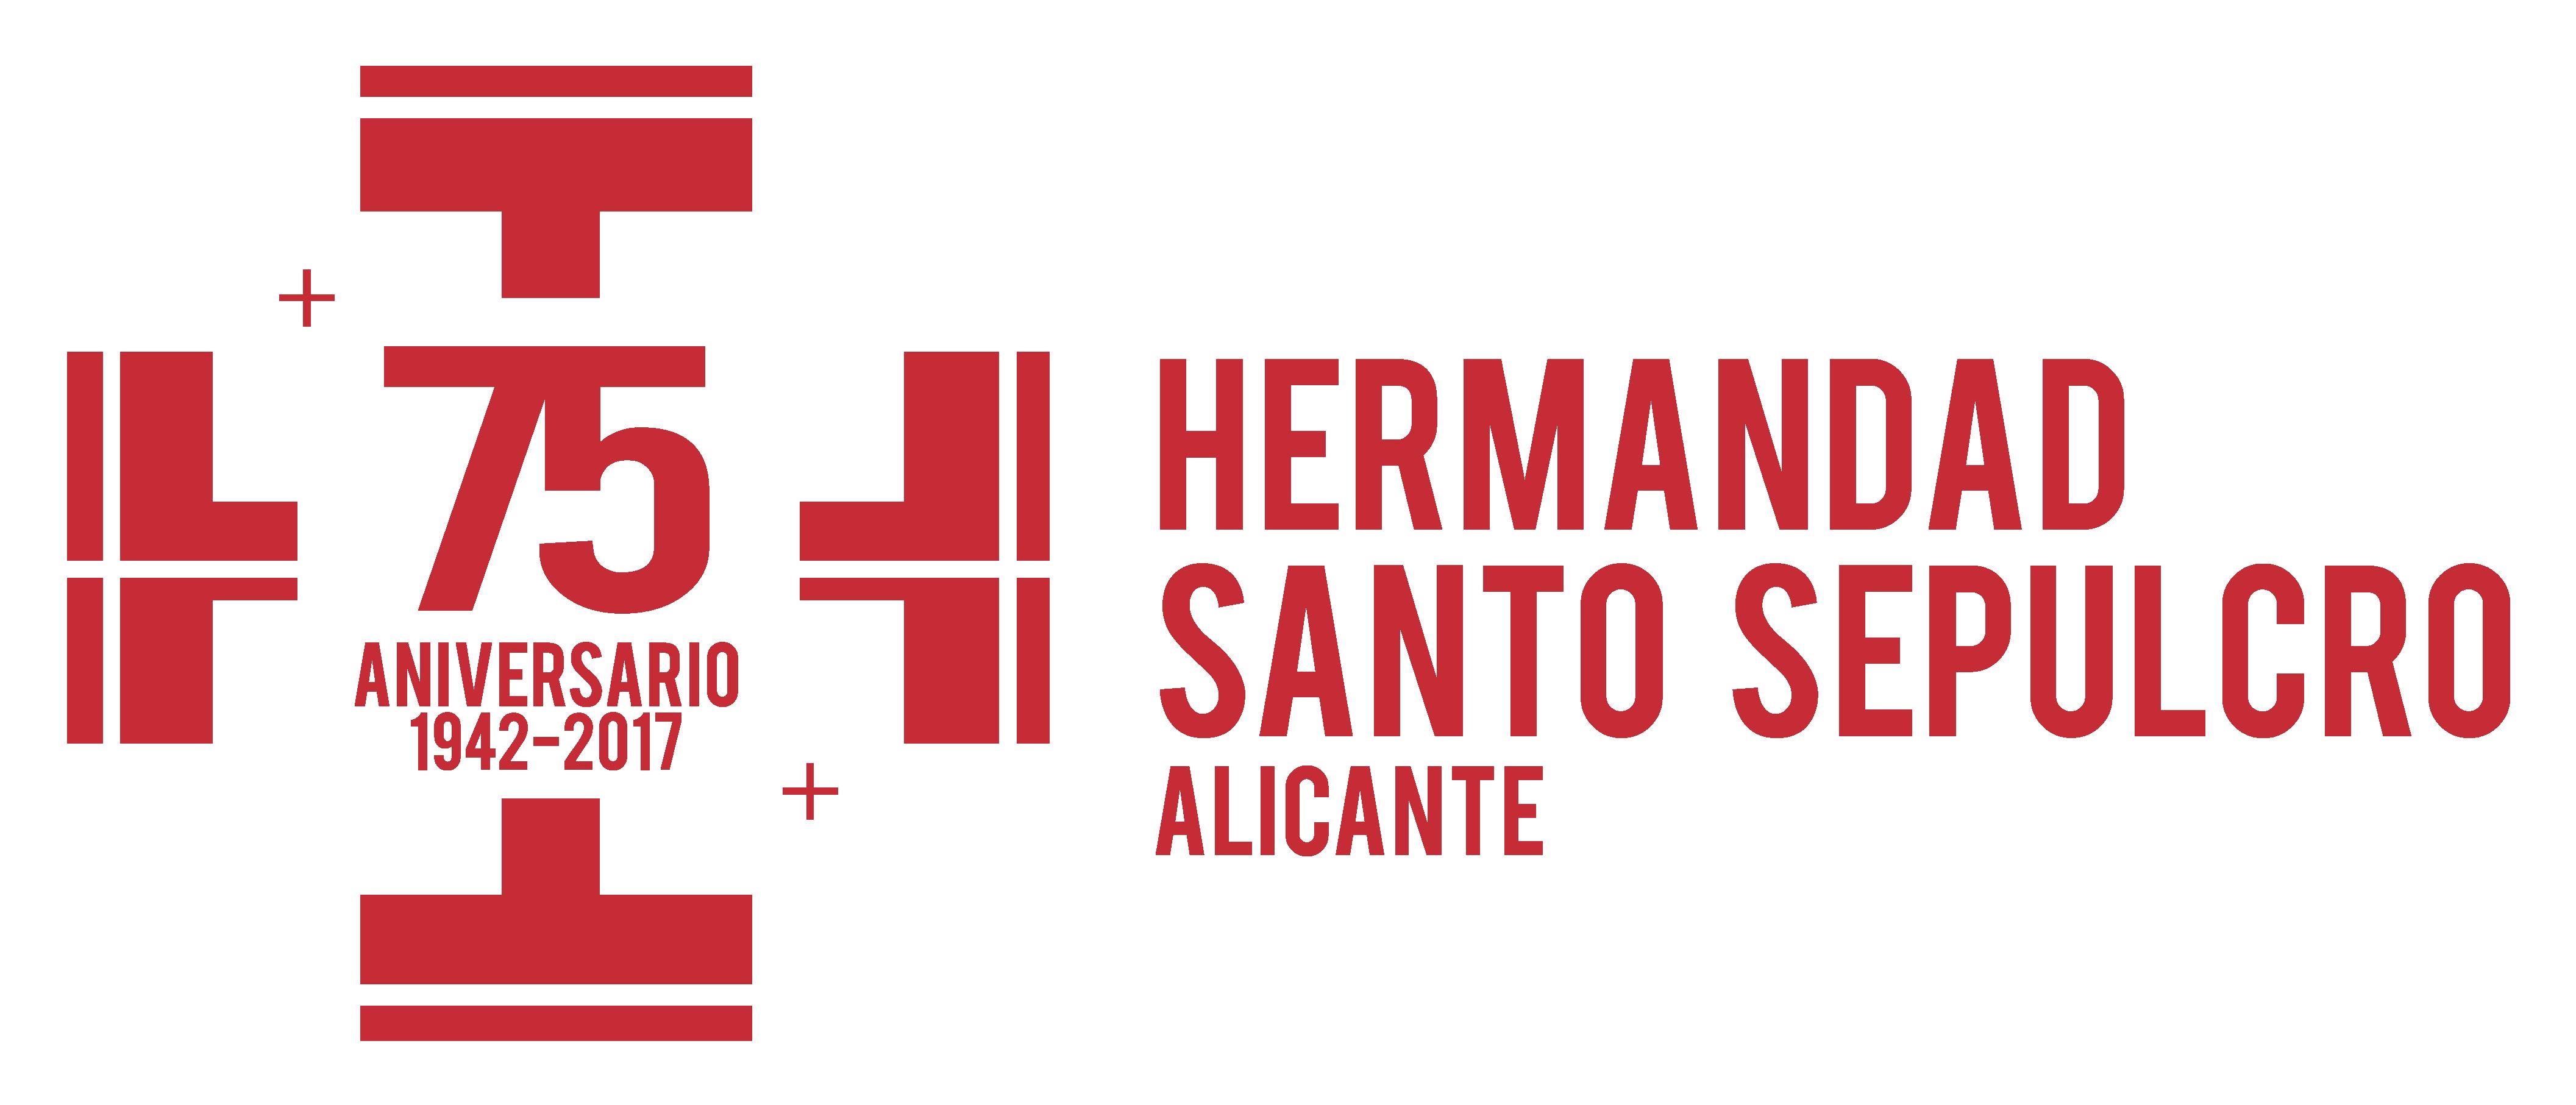 Logotipo 75 Aniversario Hermandad Santo Sepulcro